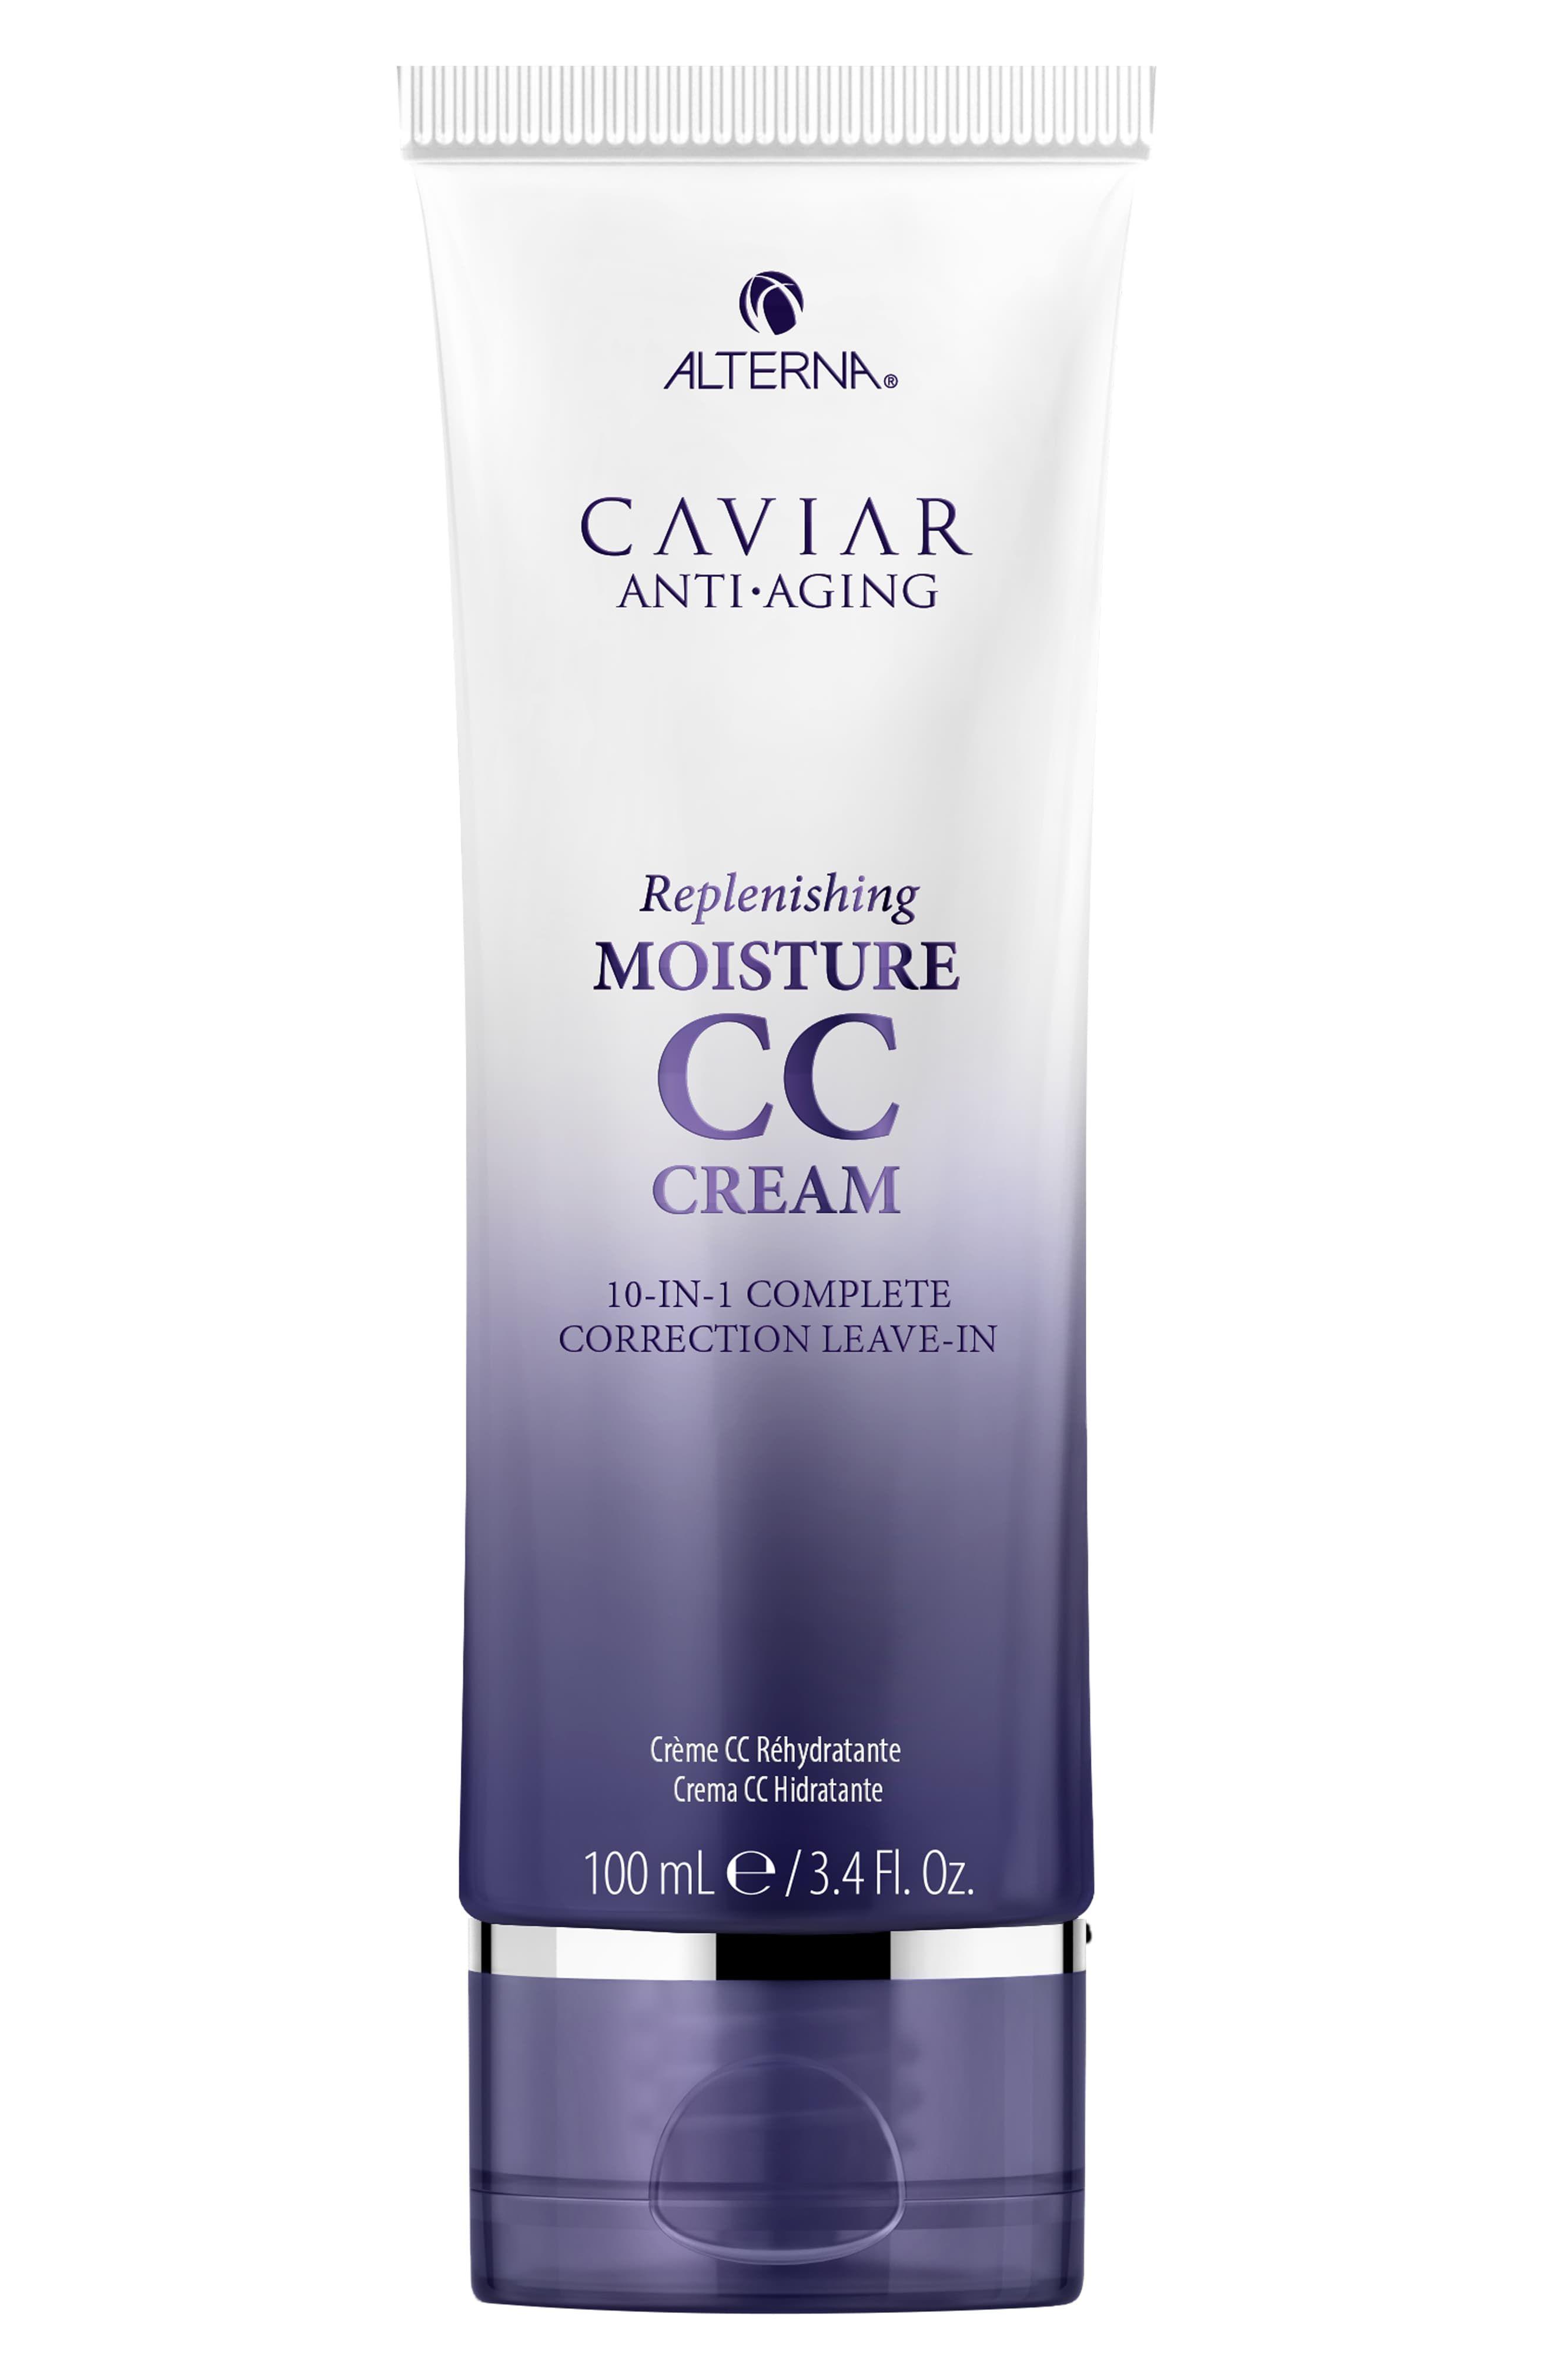 Alterna Caviar AntiAging Replenishing Moisture Cc Cream